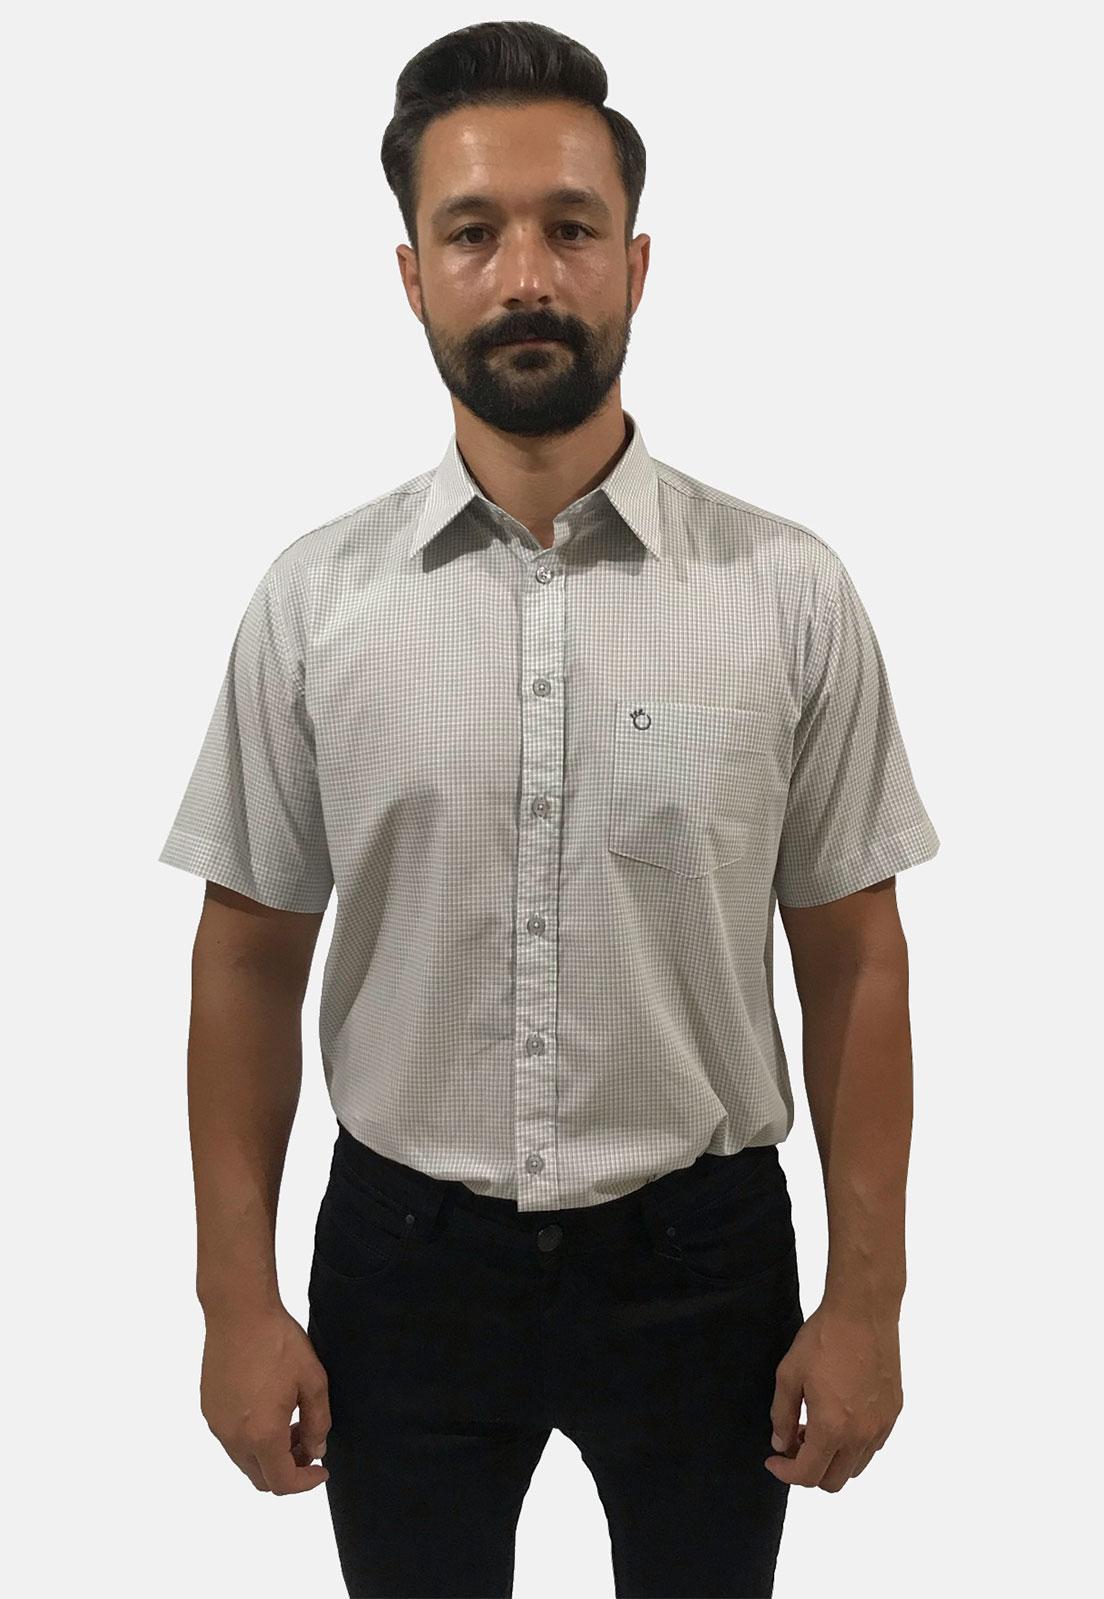 Camisa Social Masculina Olimpo Quadriculada/Xadrez com Bolso Manga Curta